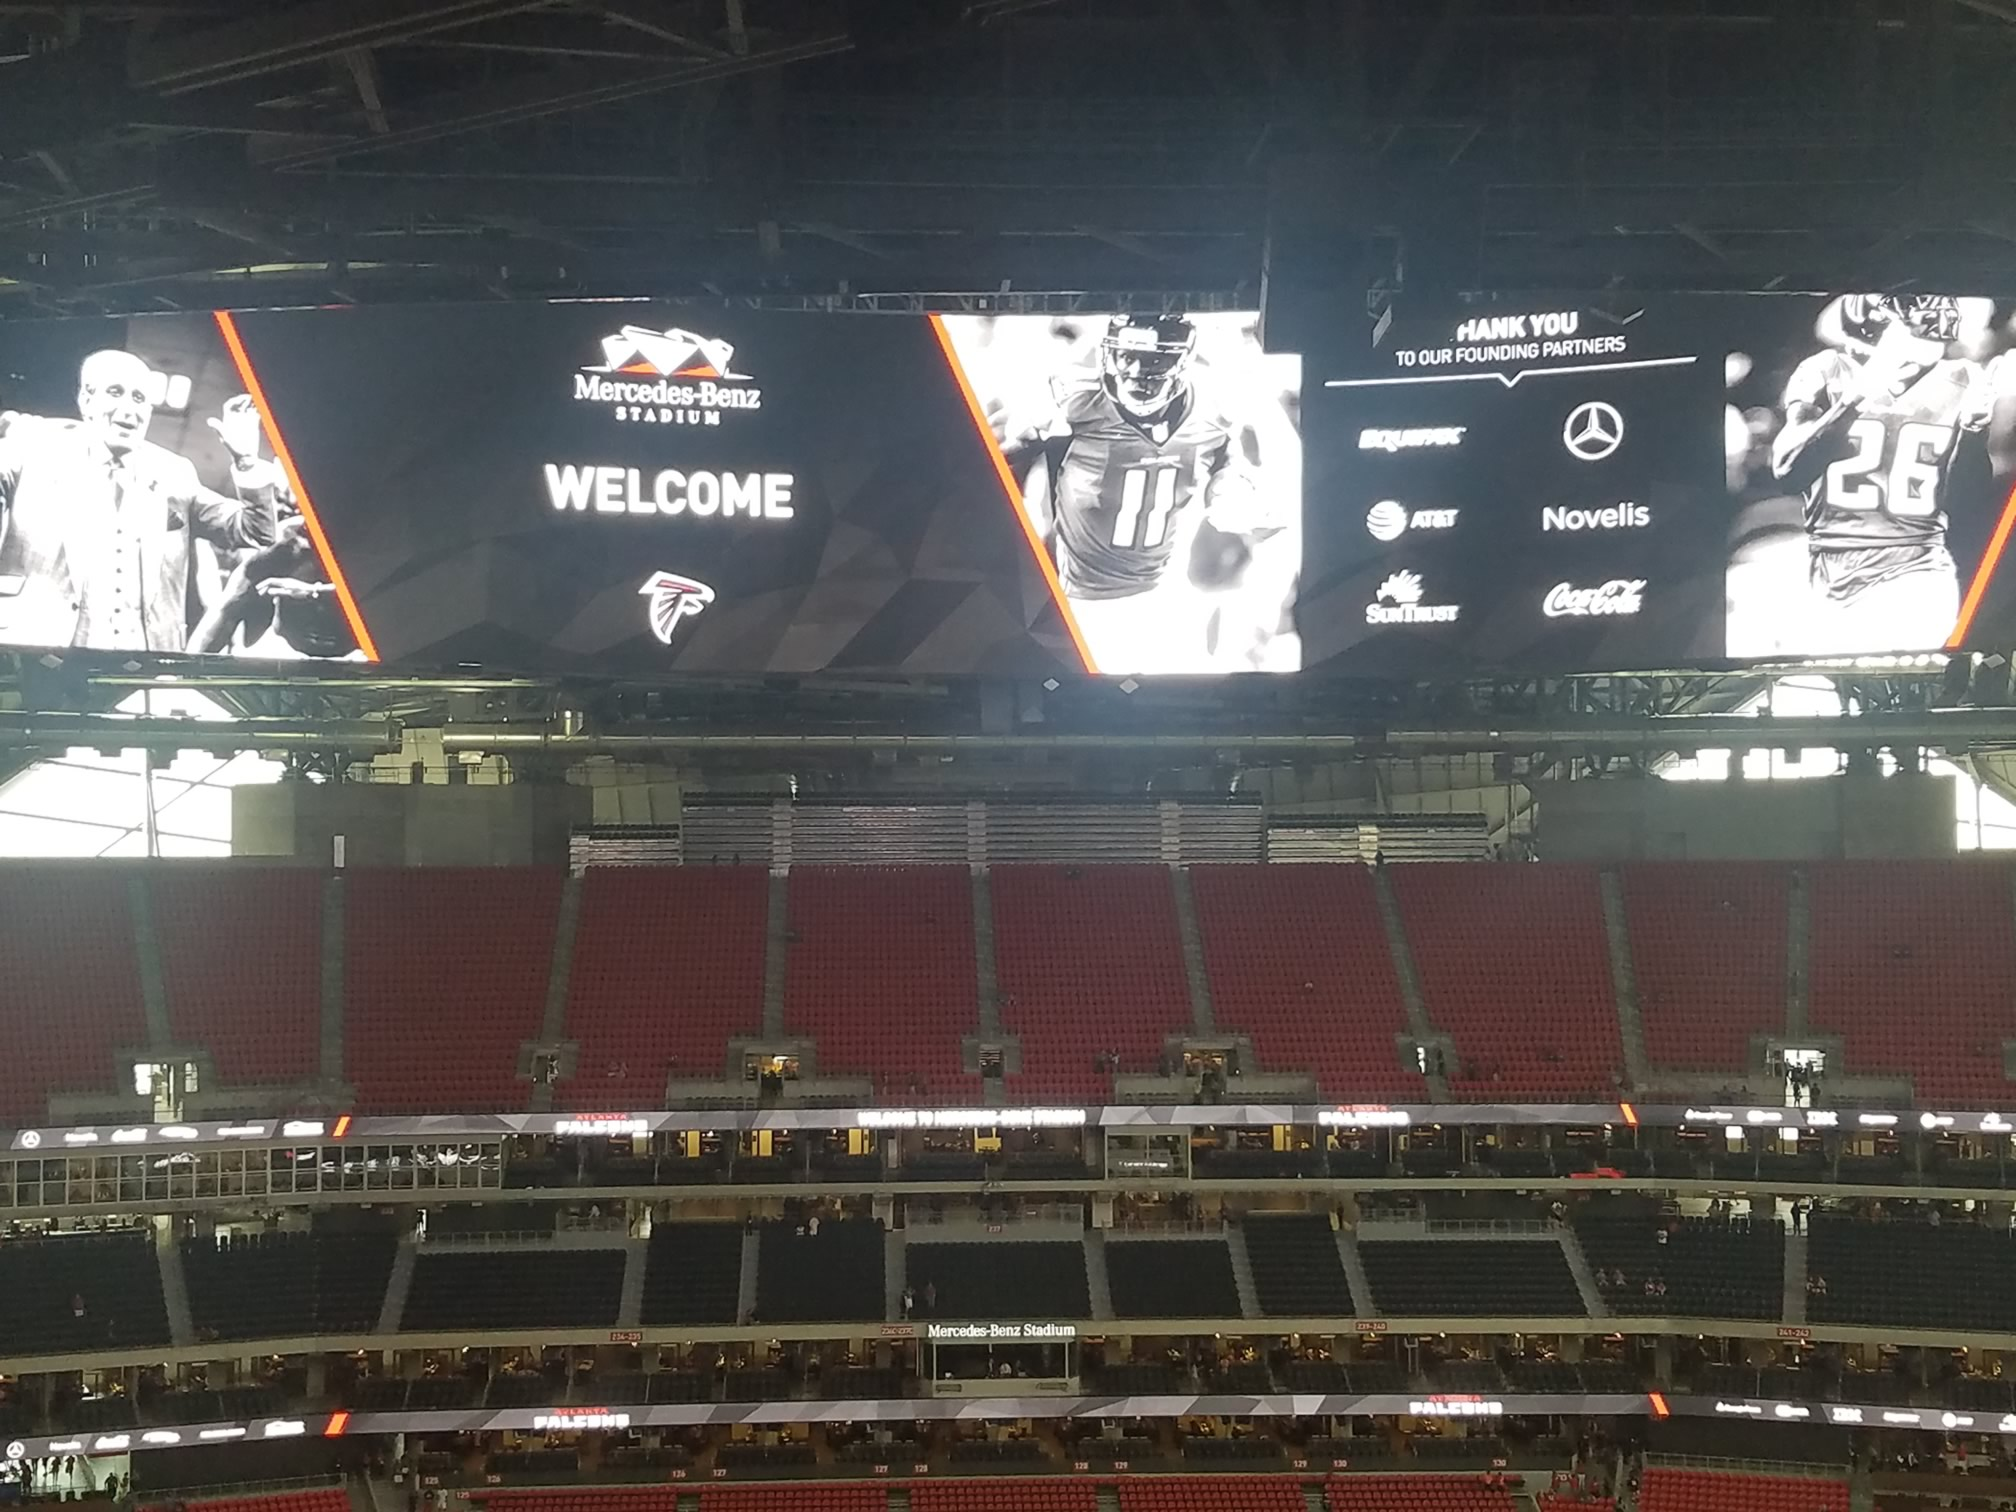 Mercedes Benz Stadium Section 326 Atlanta Falcons